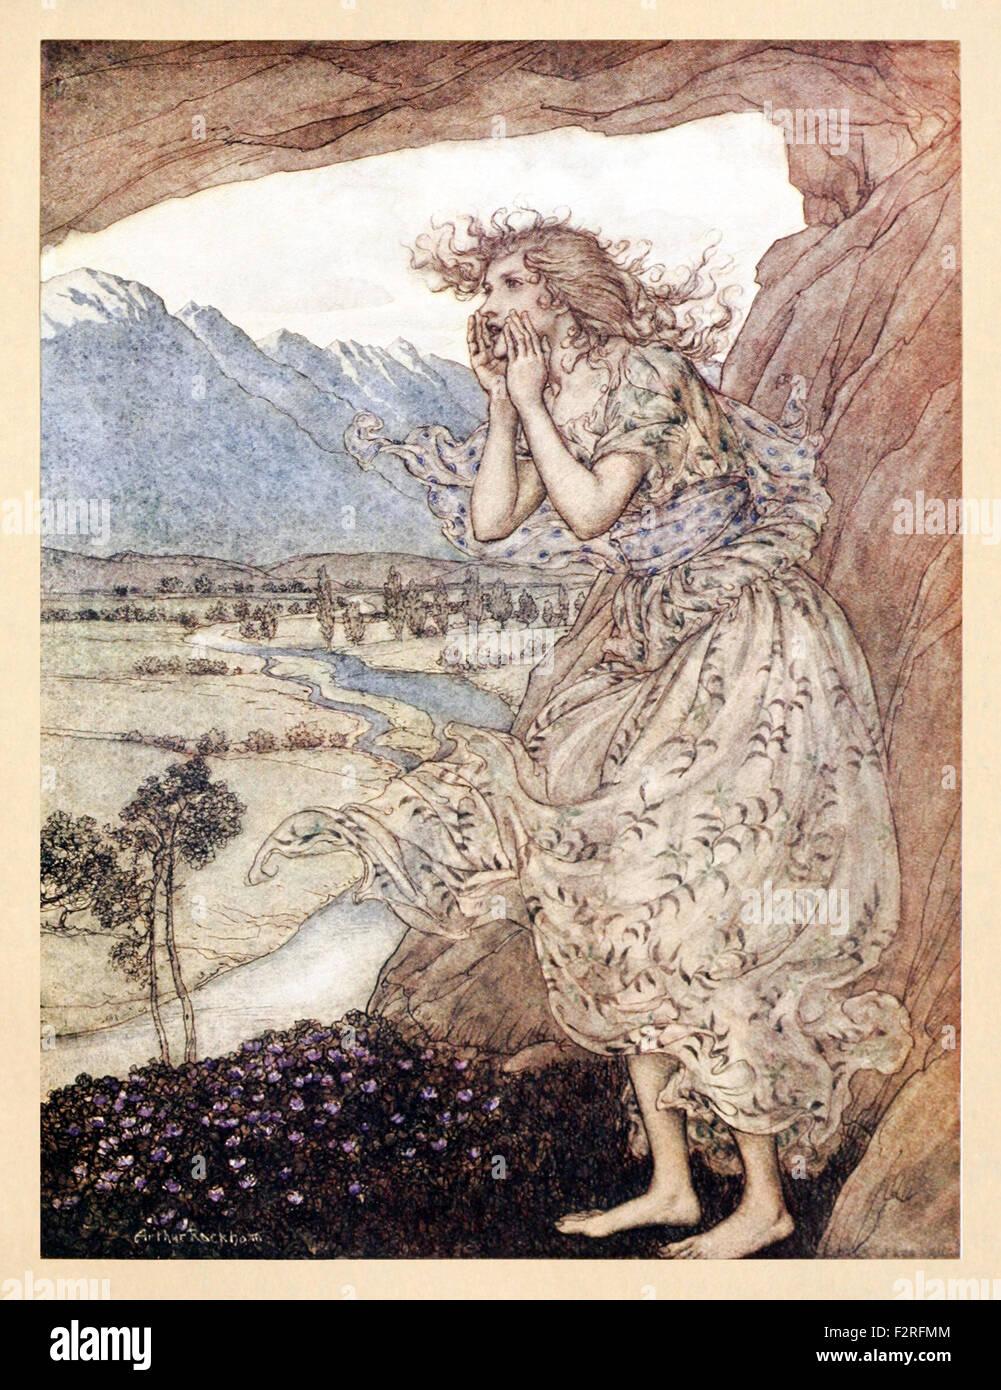 'Sweet Echo' from 'Comus' by John Milton, illustration by Arthur Rackham (1867-1939). See description - Stock Image